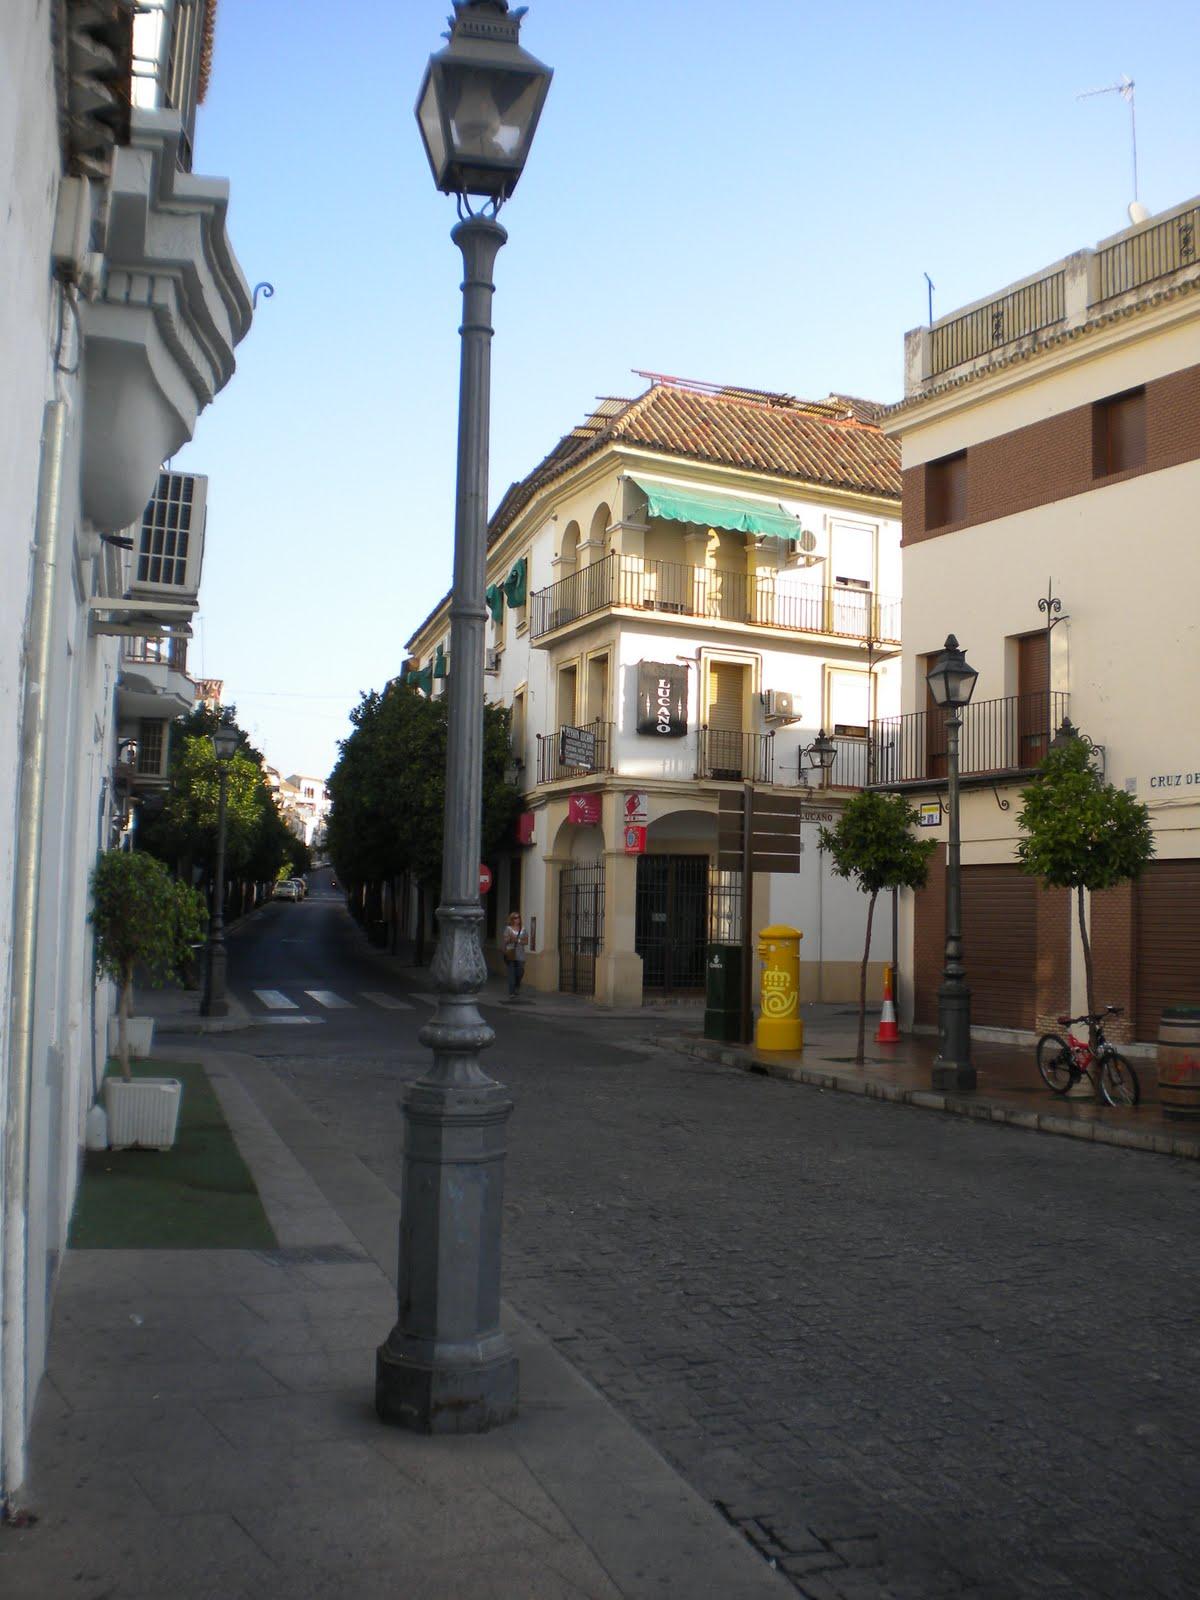 Cordoba  Encrucijada De Culturas  Historia De La Cruz Del